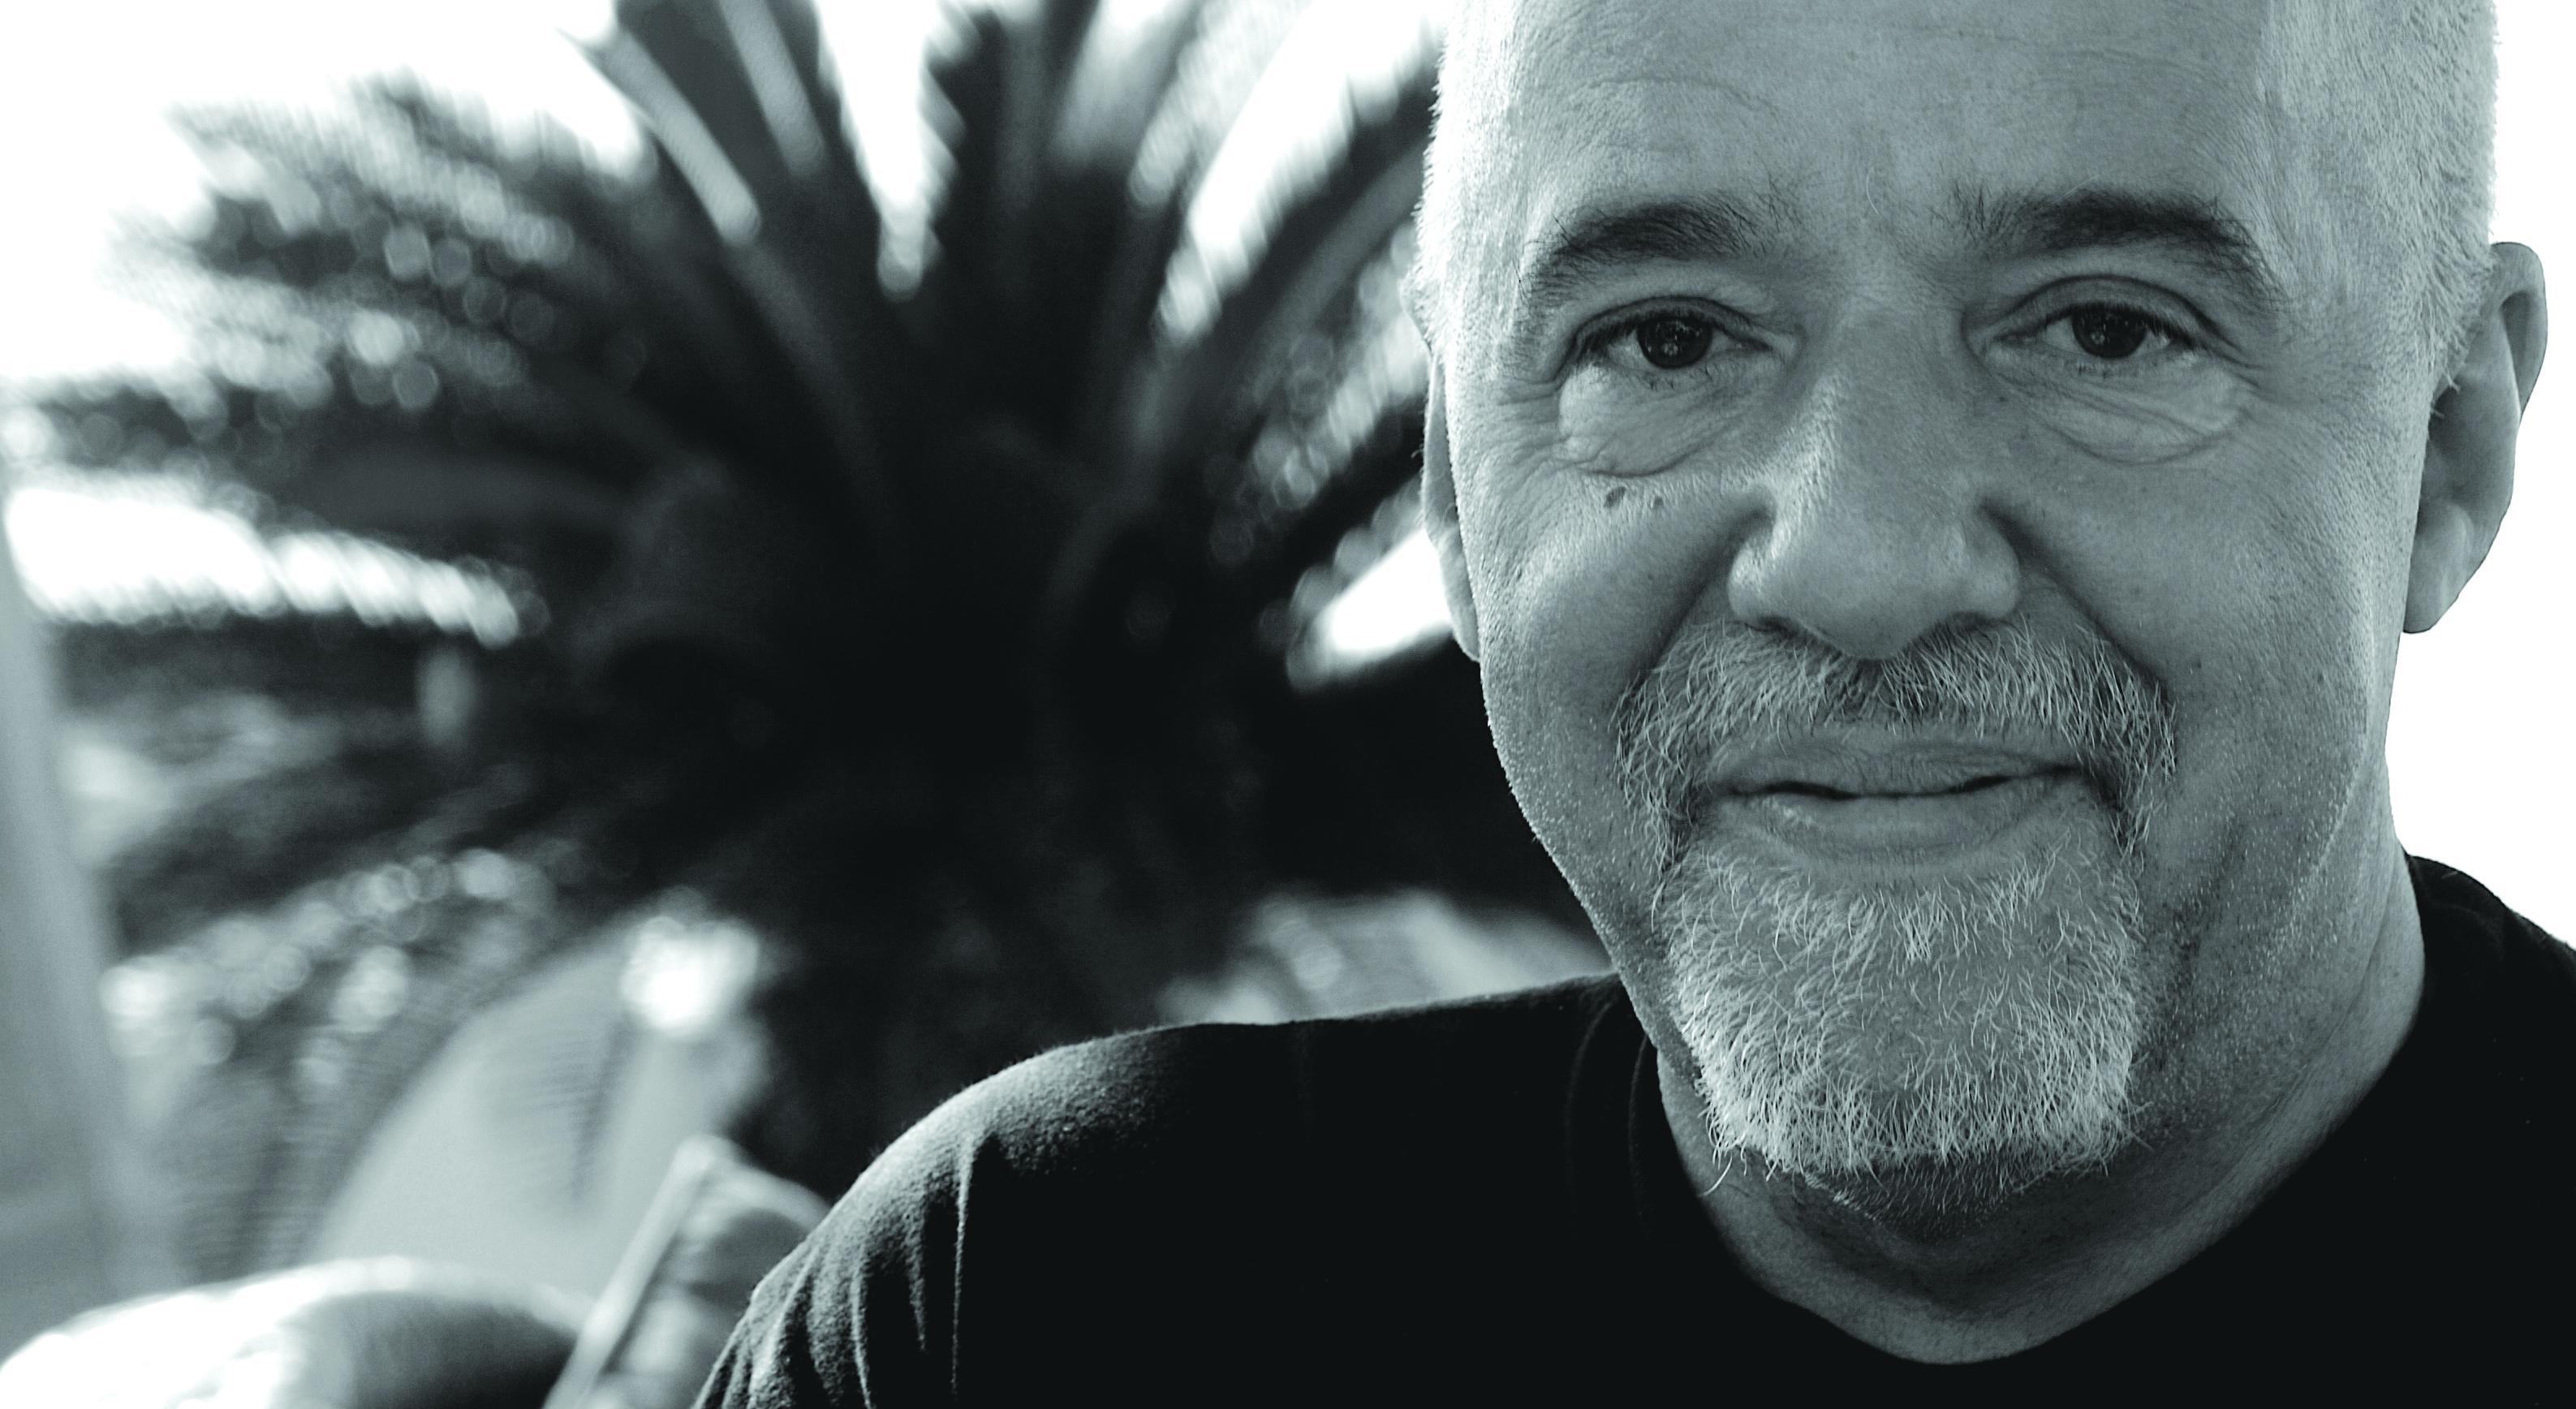 Paulo Coelho photo #108572, Paulo Coelho image